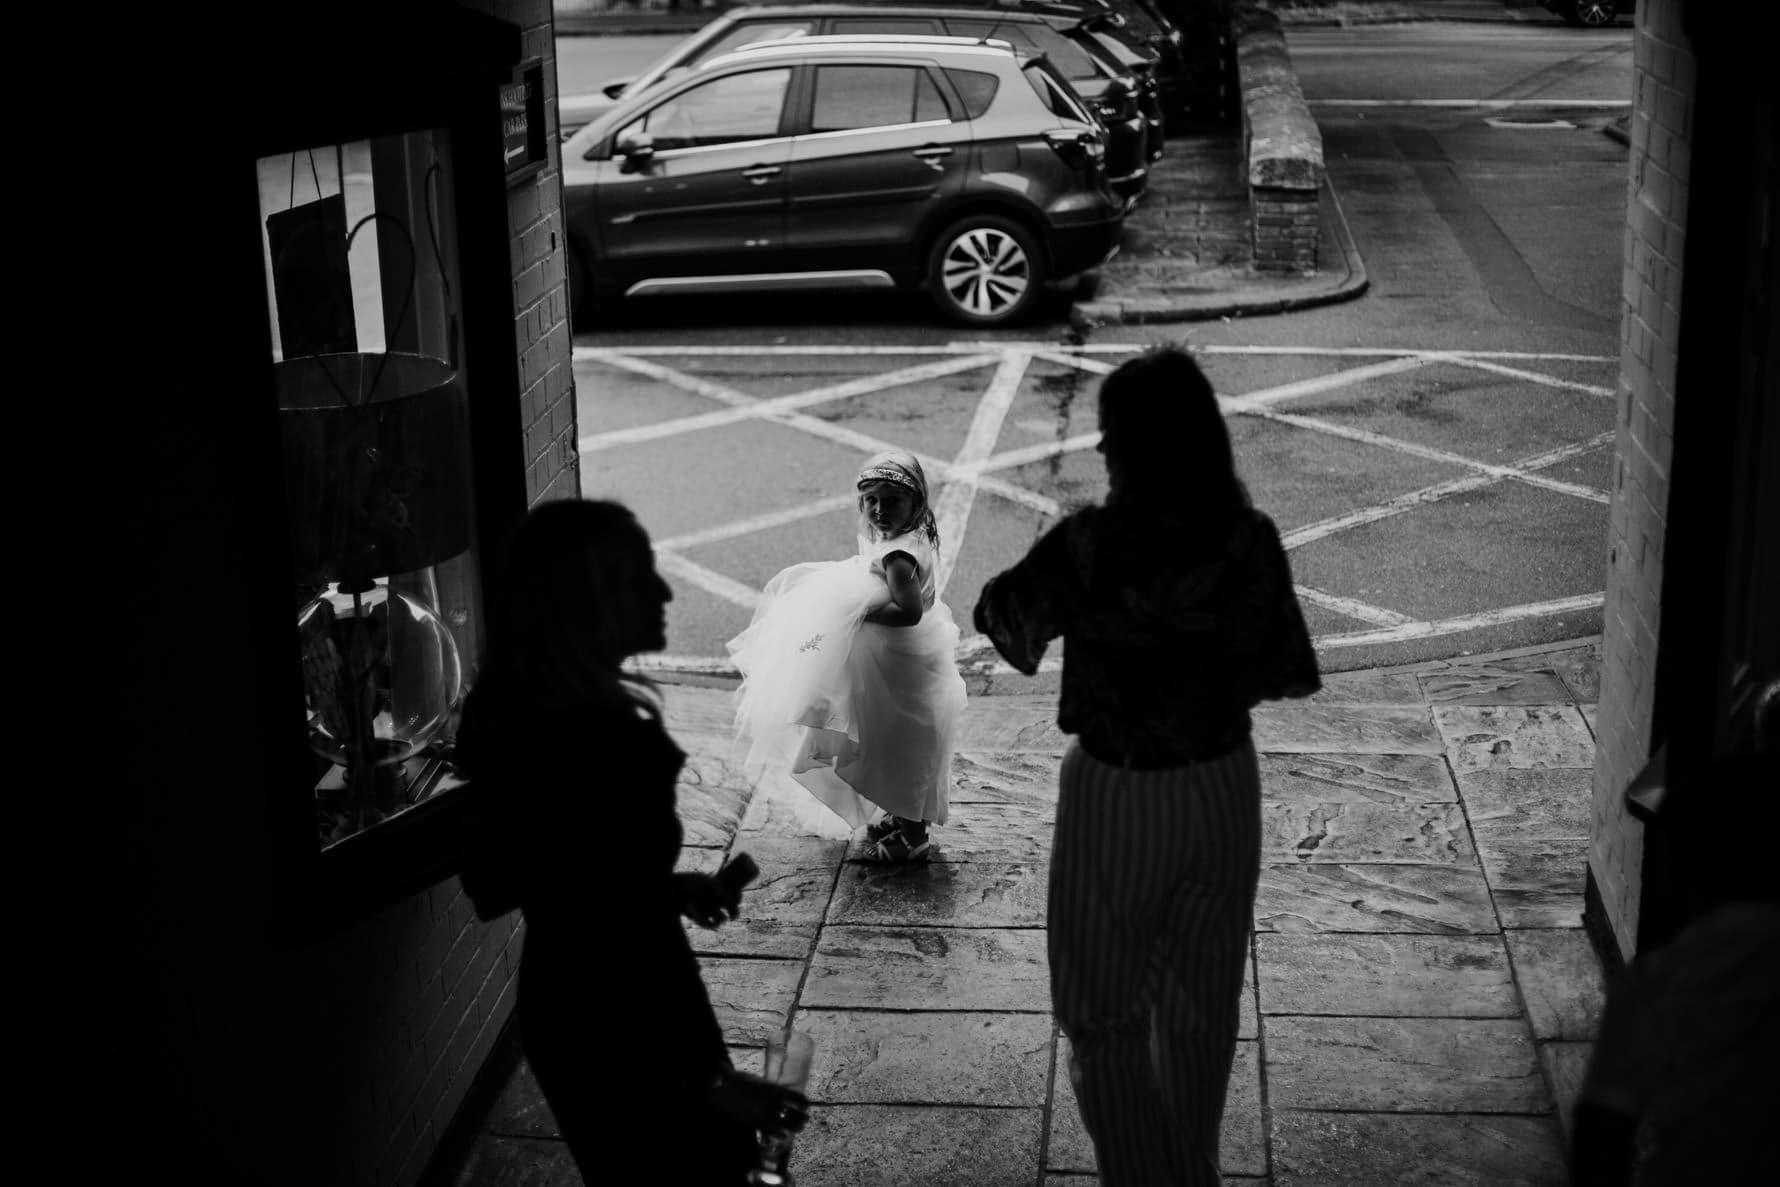 flower girl walking in the rain